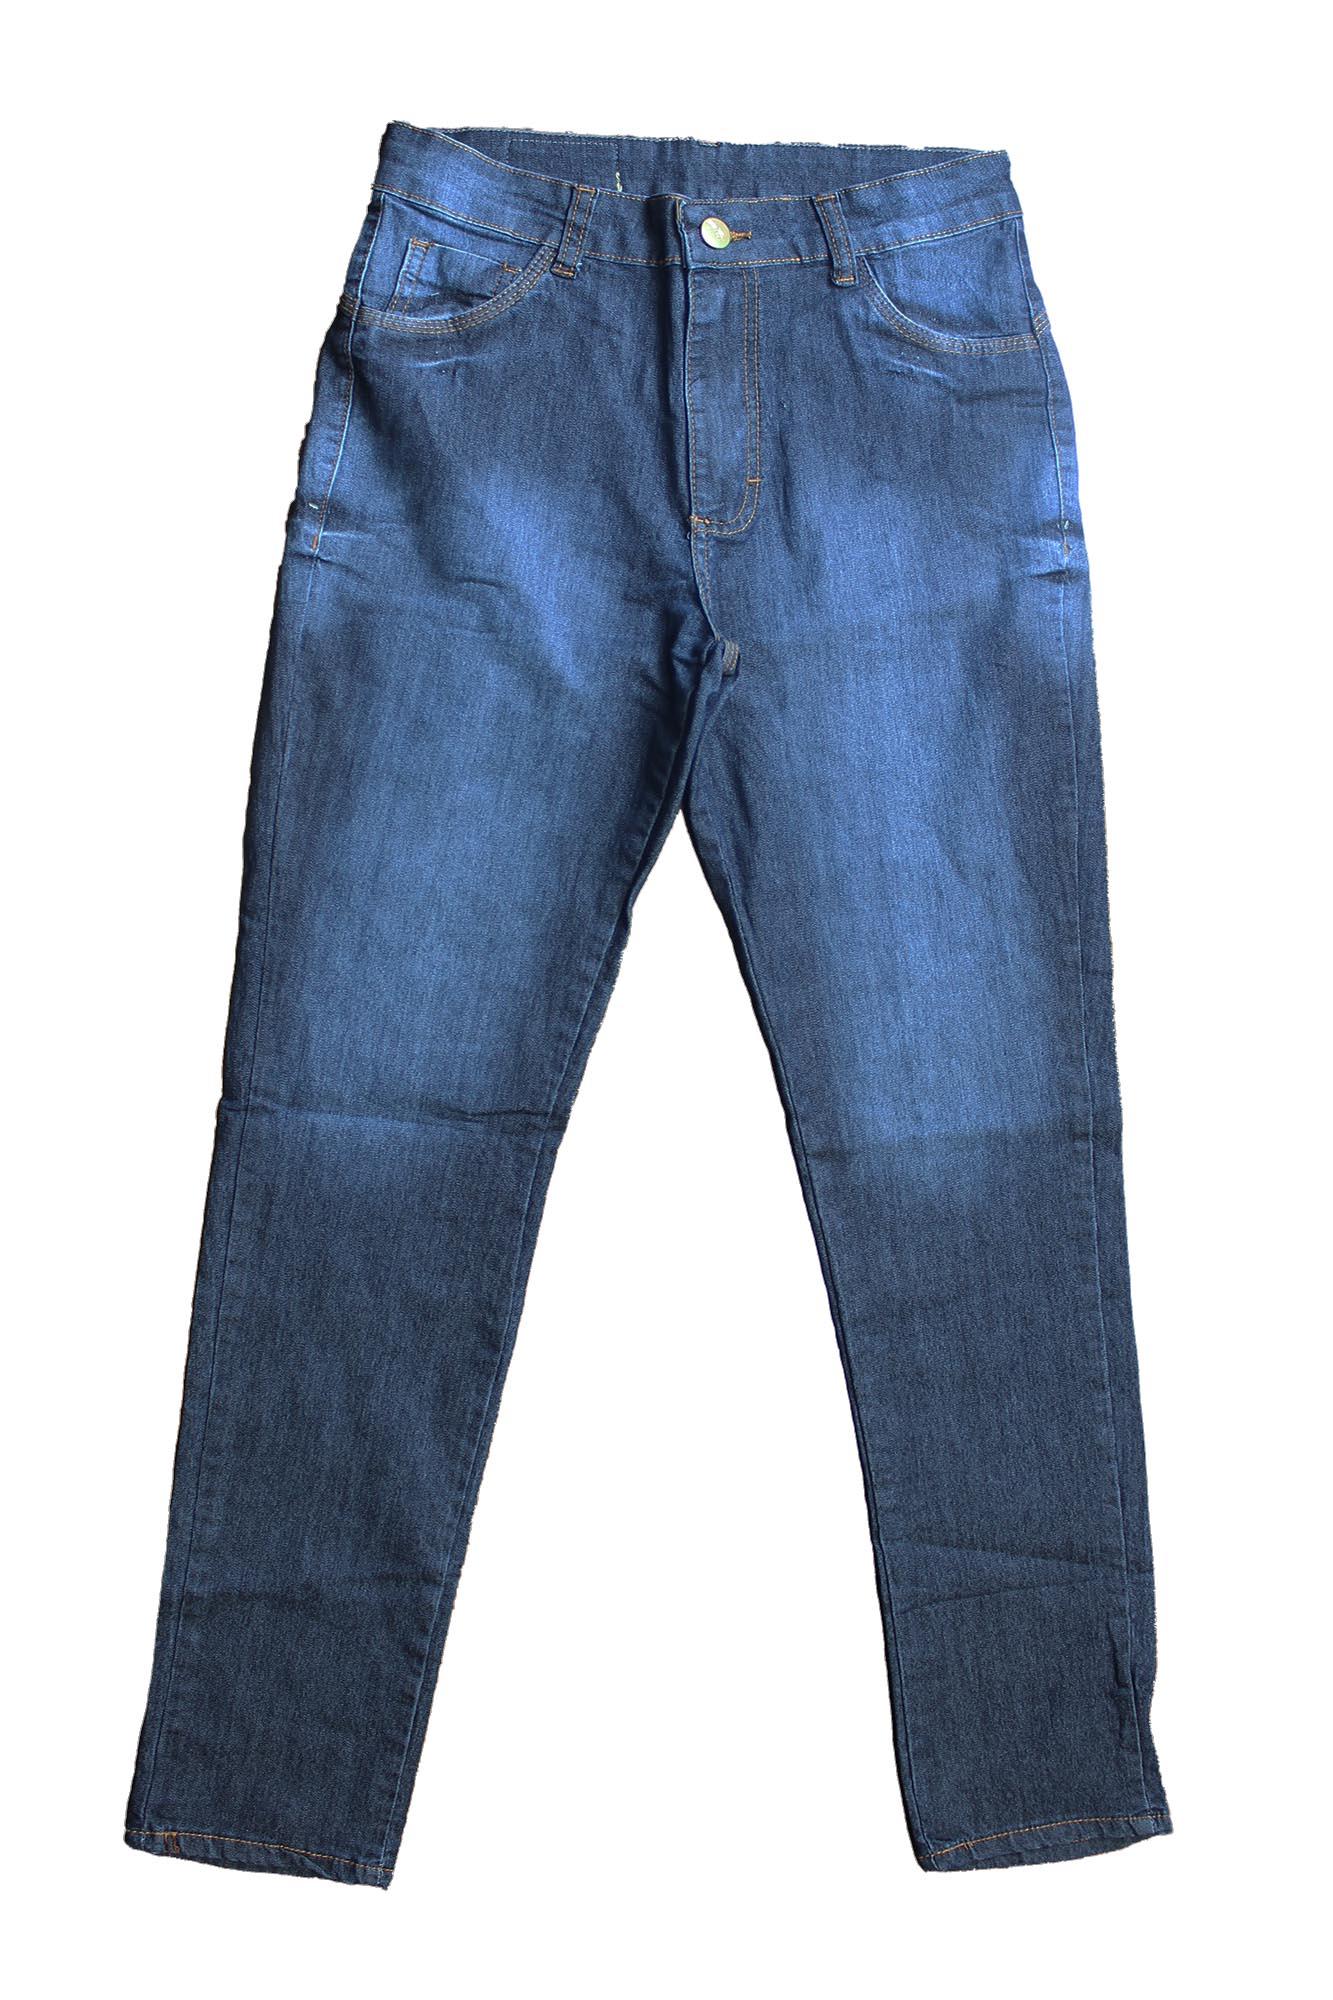 Calça Jeans Feminina Plus Size - Detalhe Perna